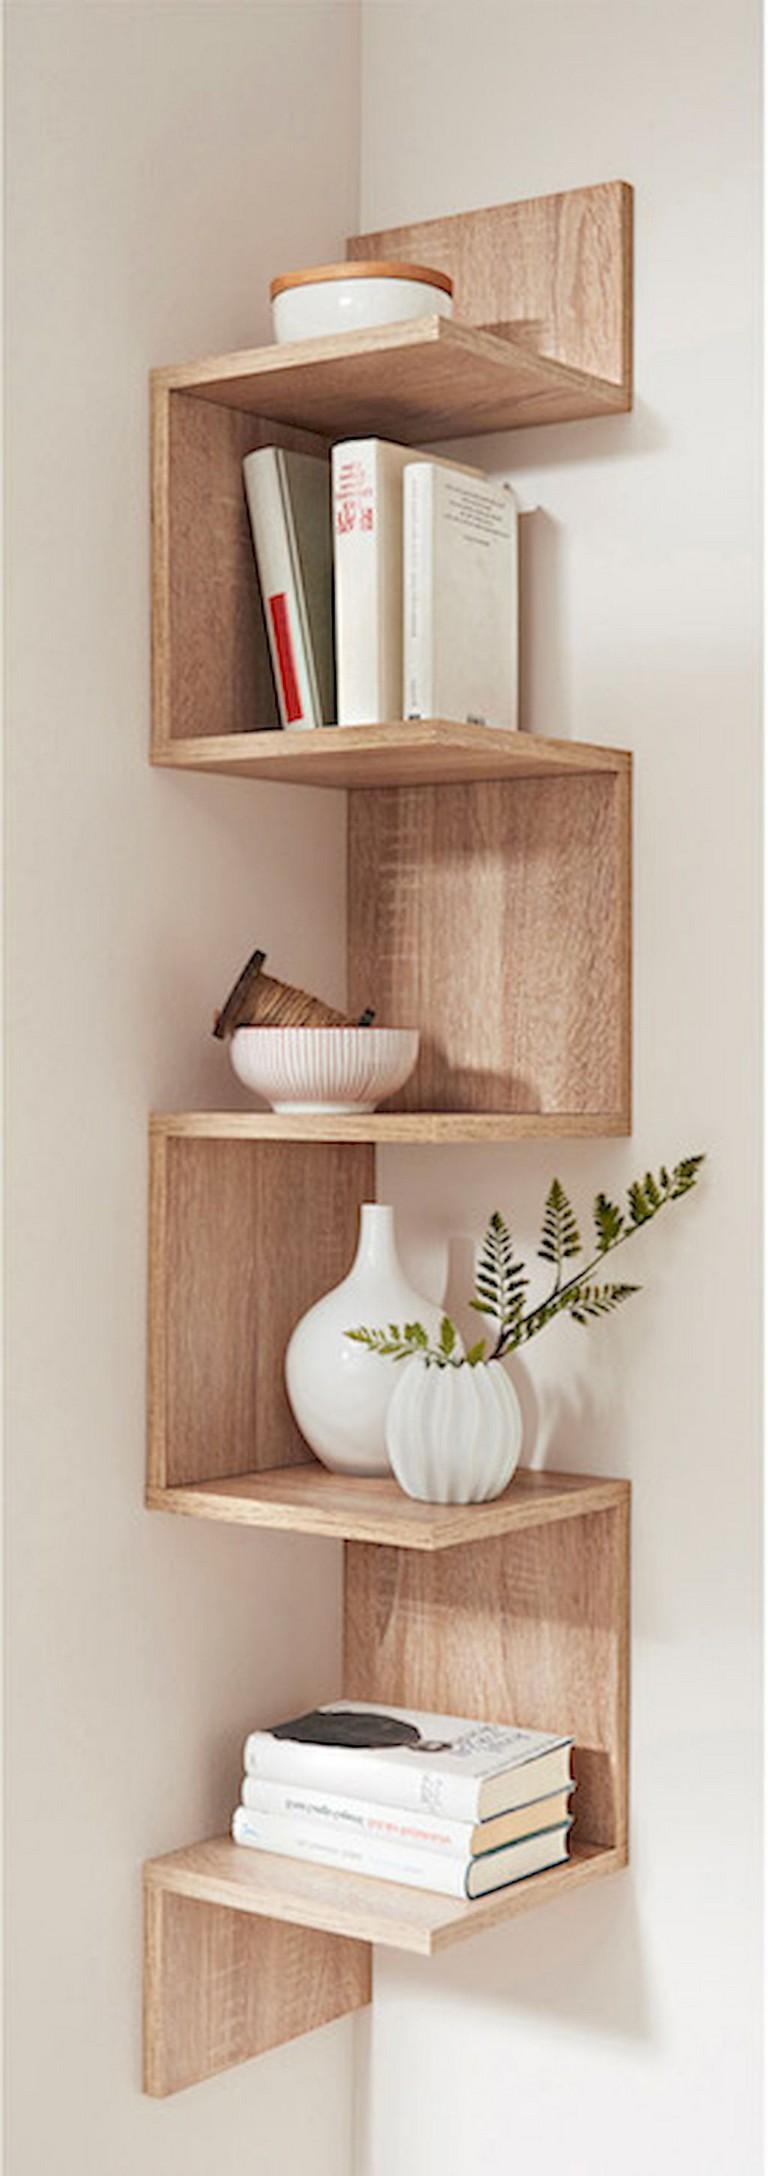 70 smart diy corner shelves ideas to decorating your